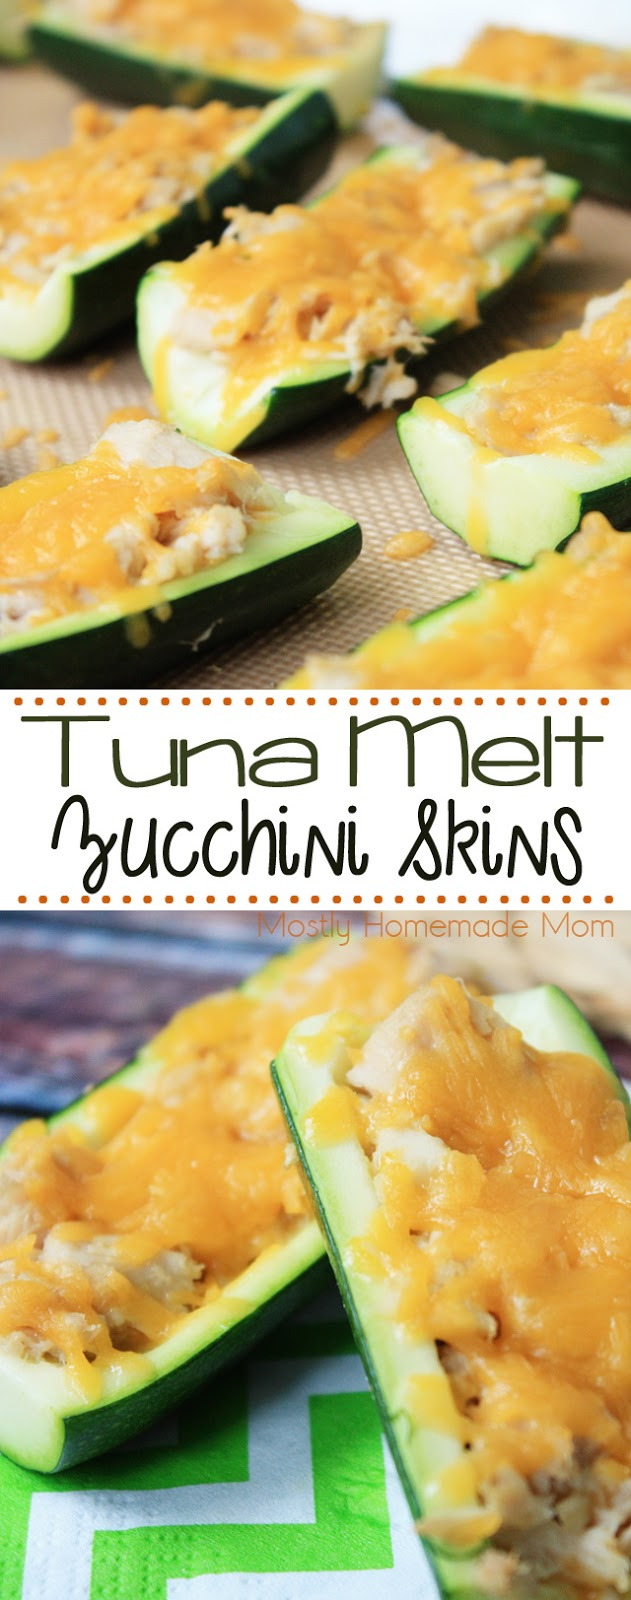 Tuna Melt Zucchini Skin